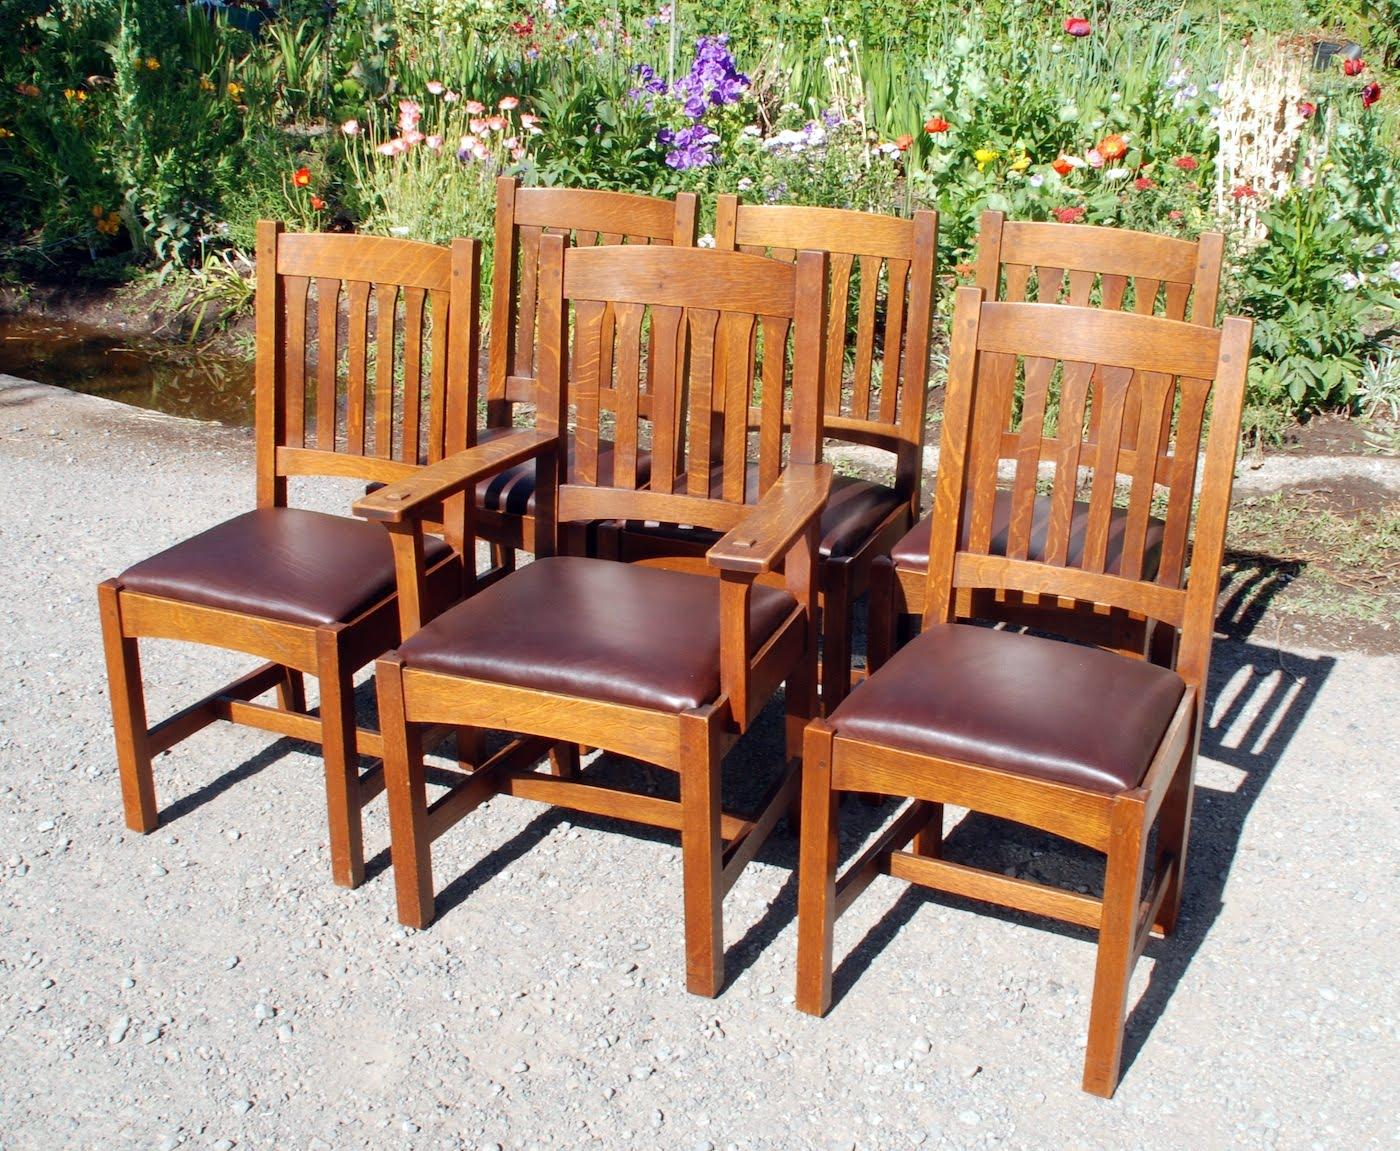 Voorhees Craftsman Mission Oak Furniture Set of 6  : Set20of20620Original20L20amp20J20G20Stickley20Dining20Chairs20in20excellent20original20finish from www.voorheescraftsman.com size 1400 x 1151 jpeg 430kB